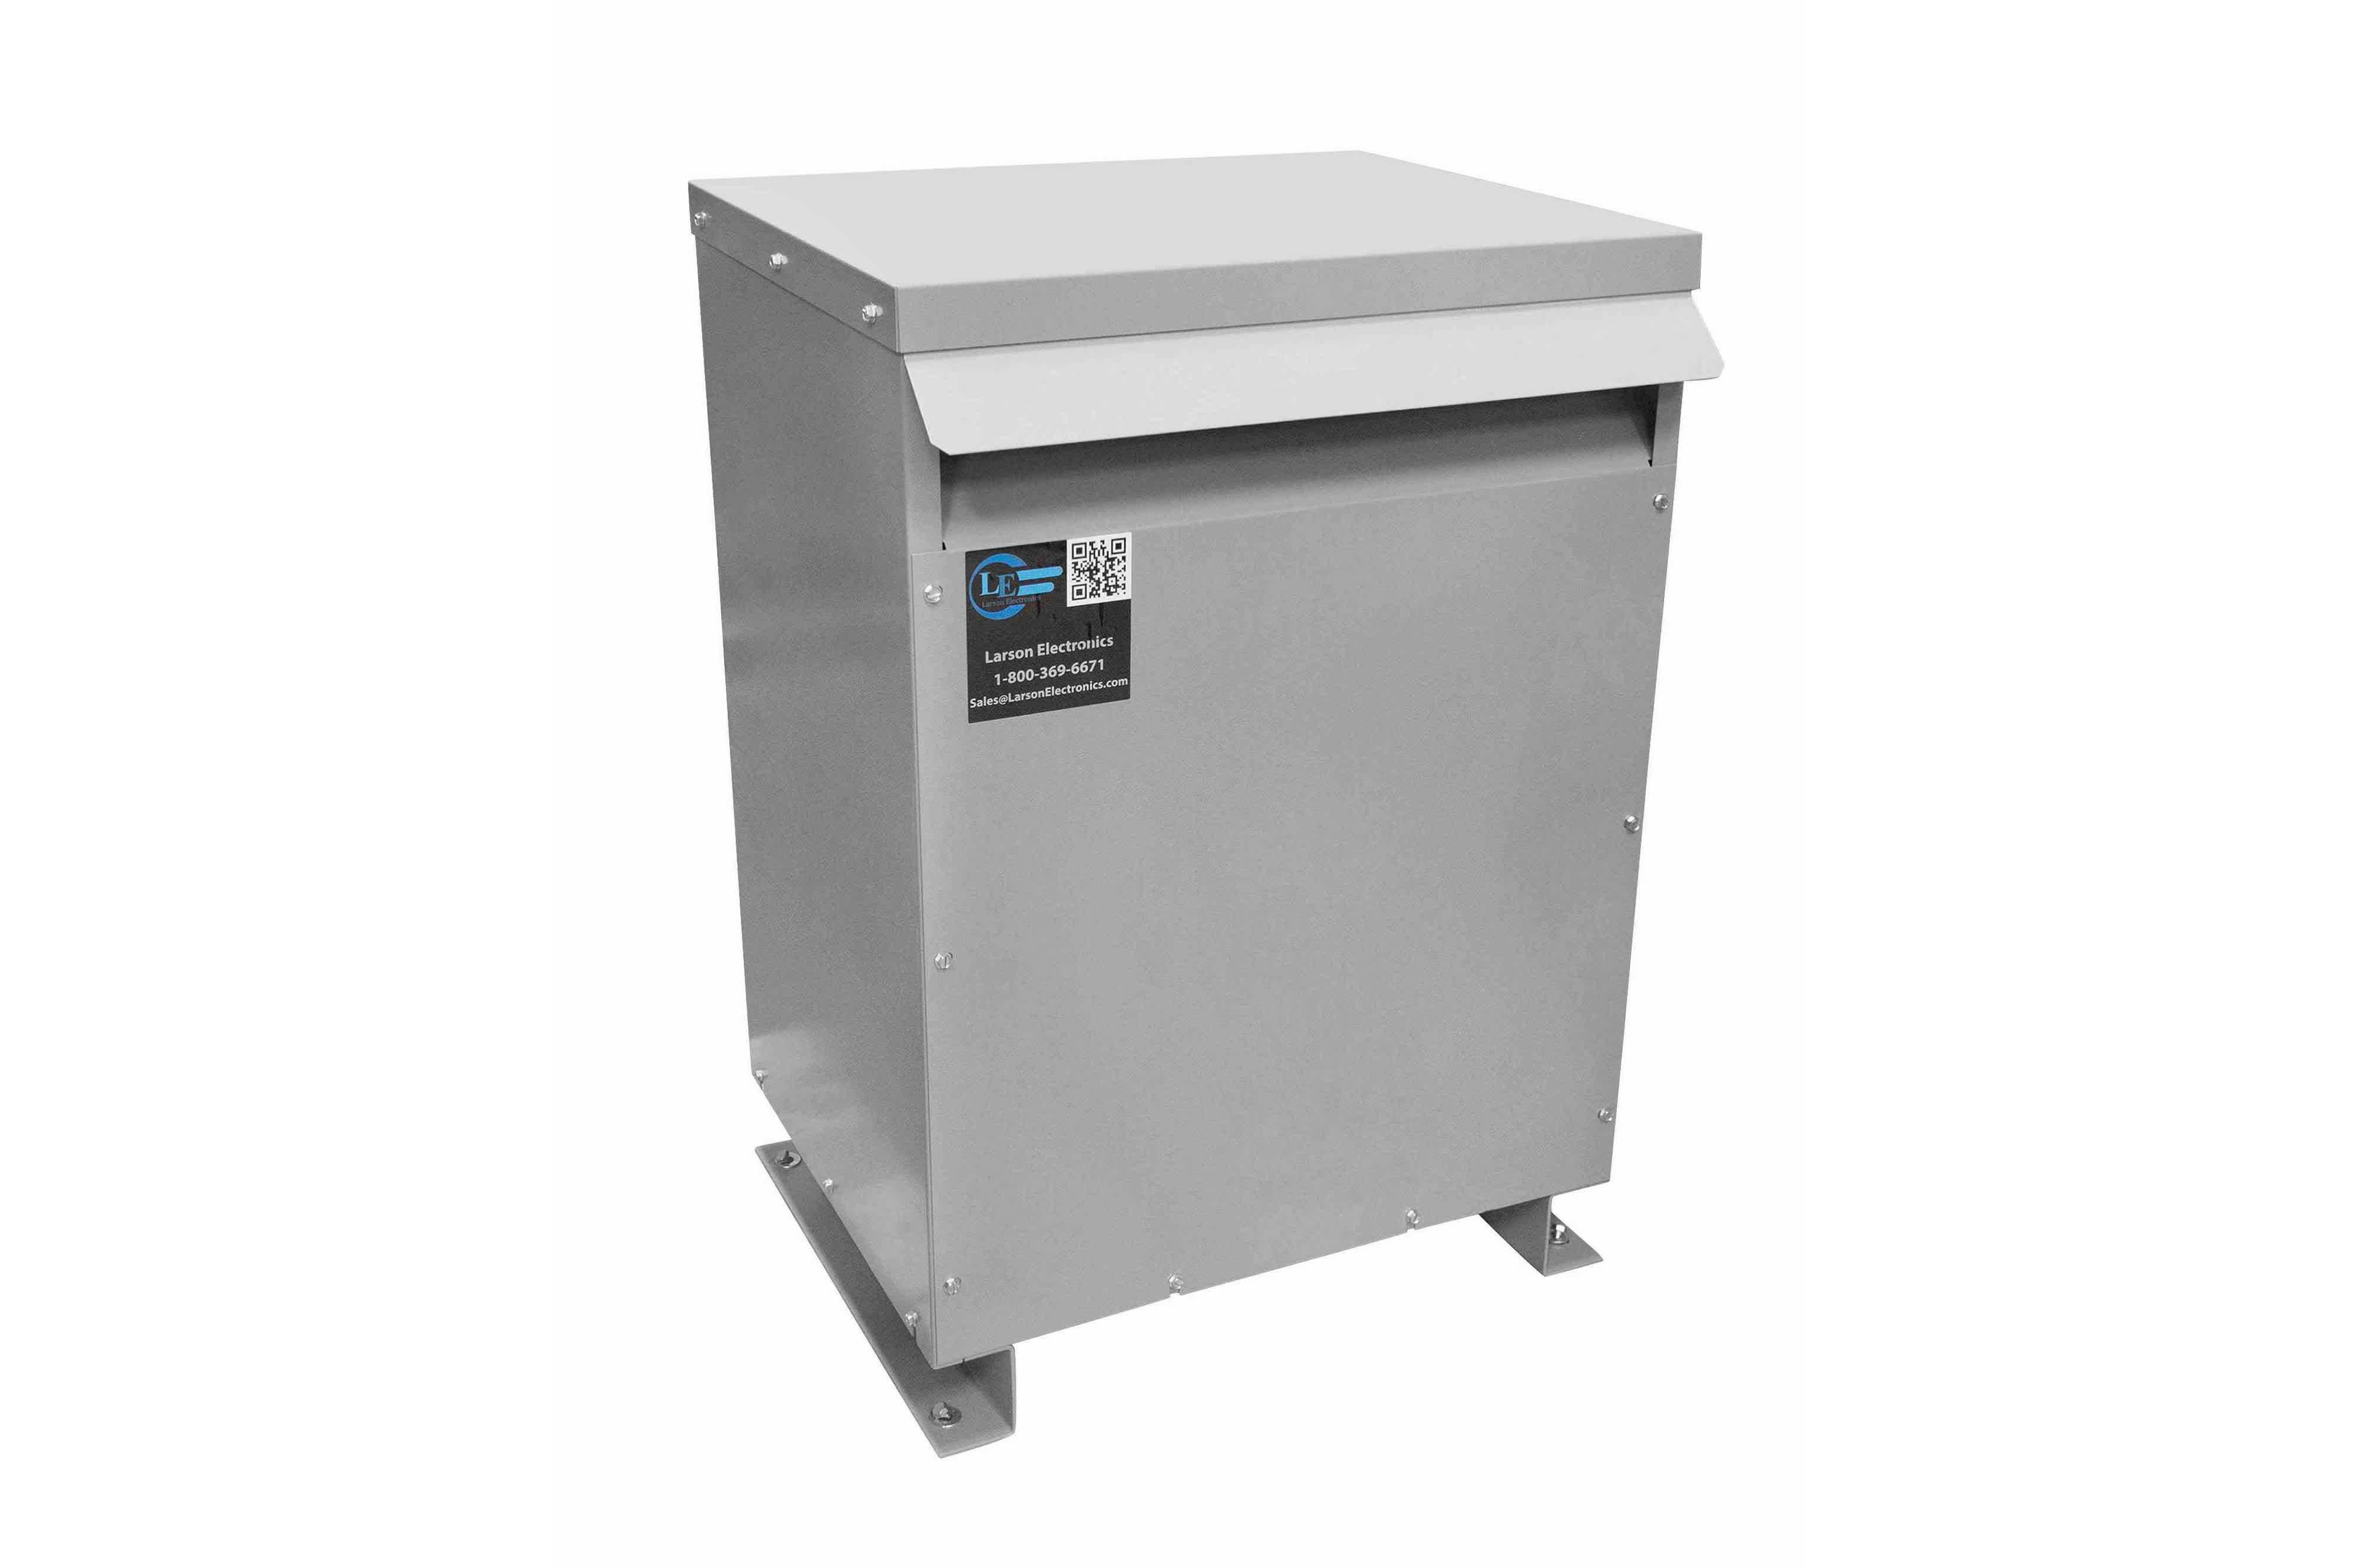 110 kVA 3PH Isolation Transformer, 240V Wye Primary, 480Y/277 Wye-N Secondary, N3R, Ventilated, 60 Hz